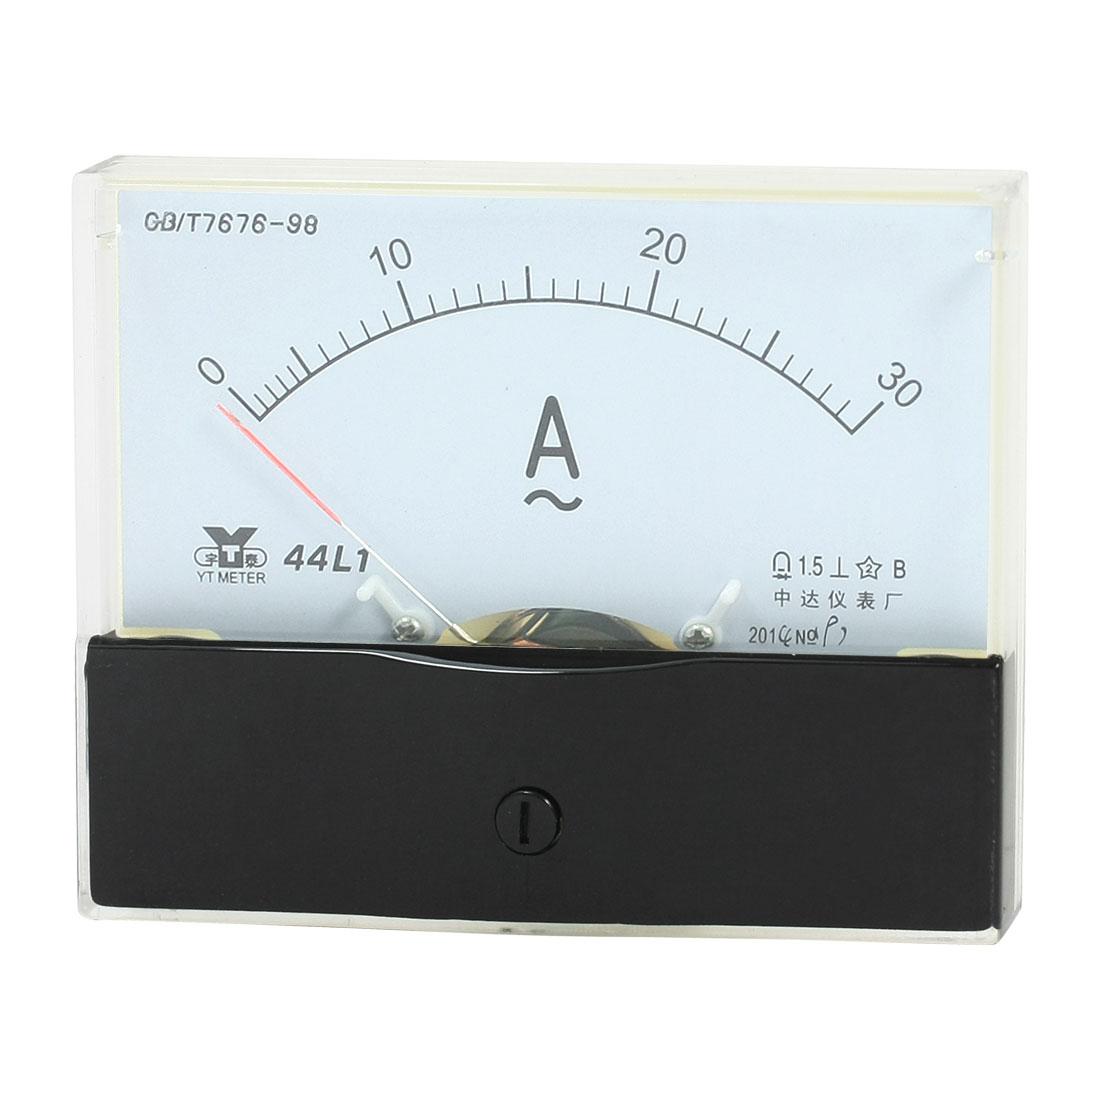 Measurement Tool Panel Mount Analog Ammeter Gauge AC 0 - 30A Measuring Range 44L1